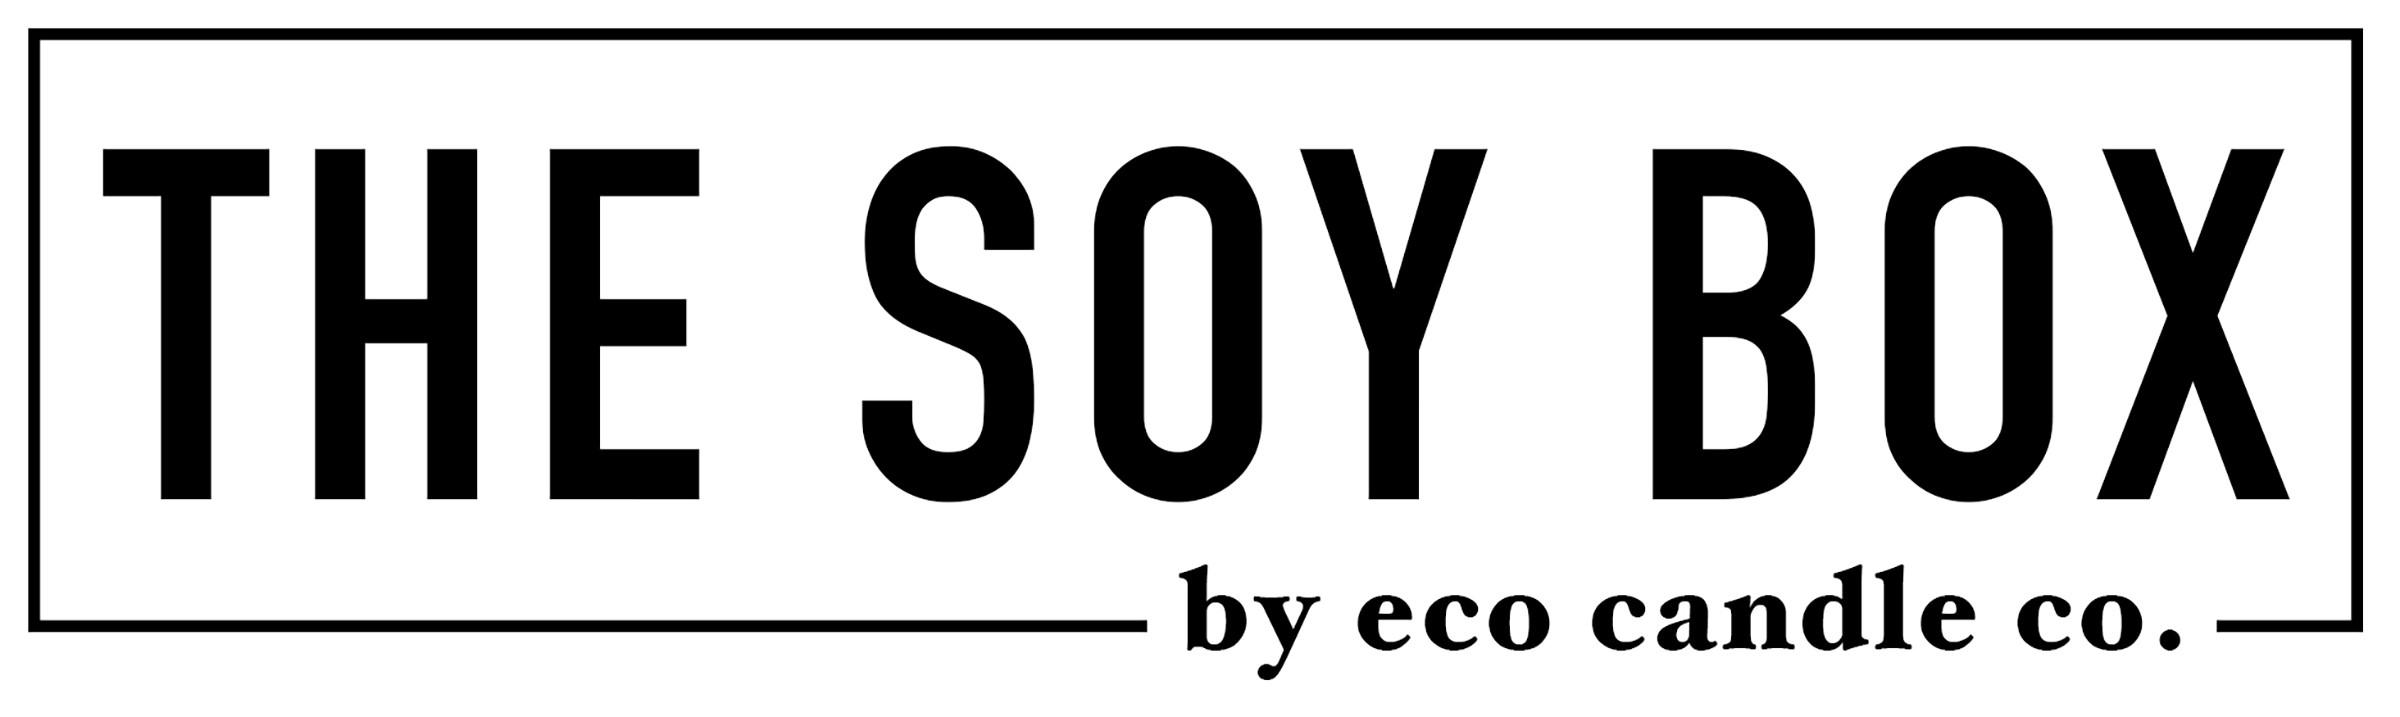 thesoybox-logo.jpg